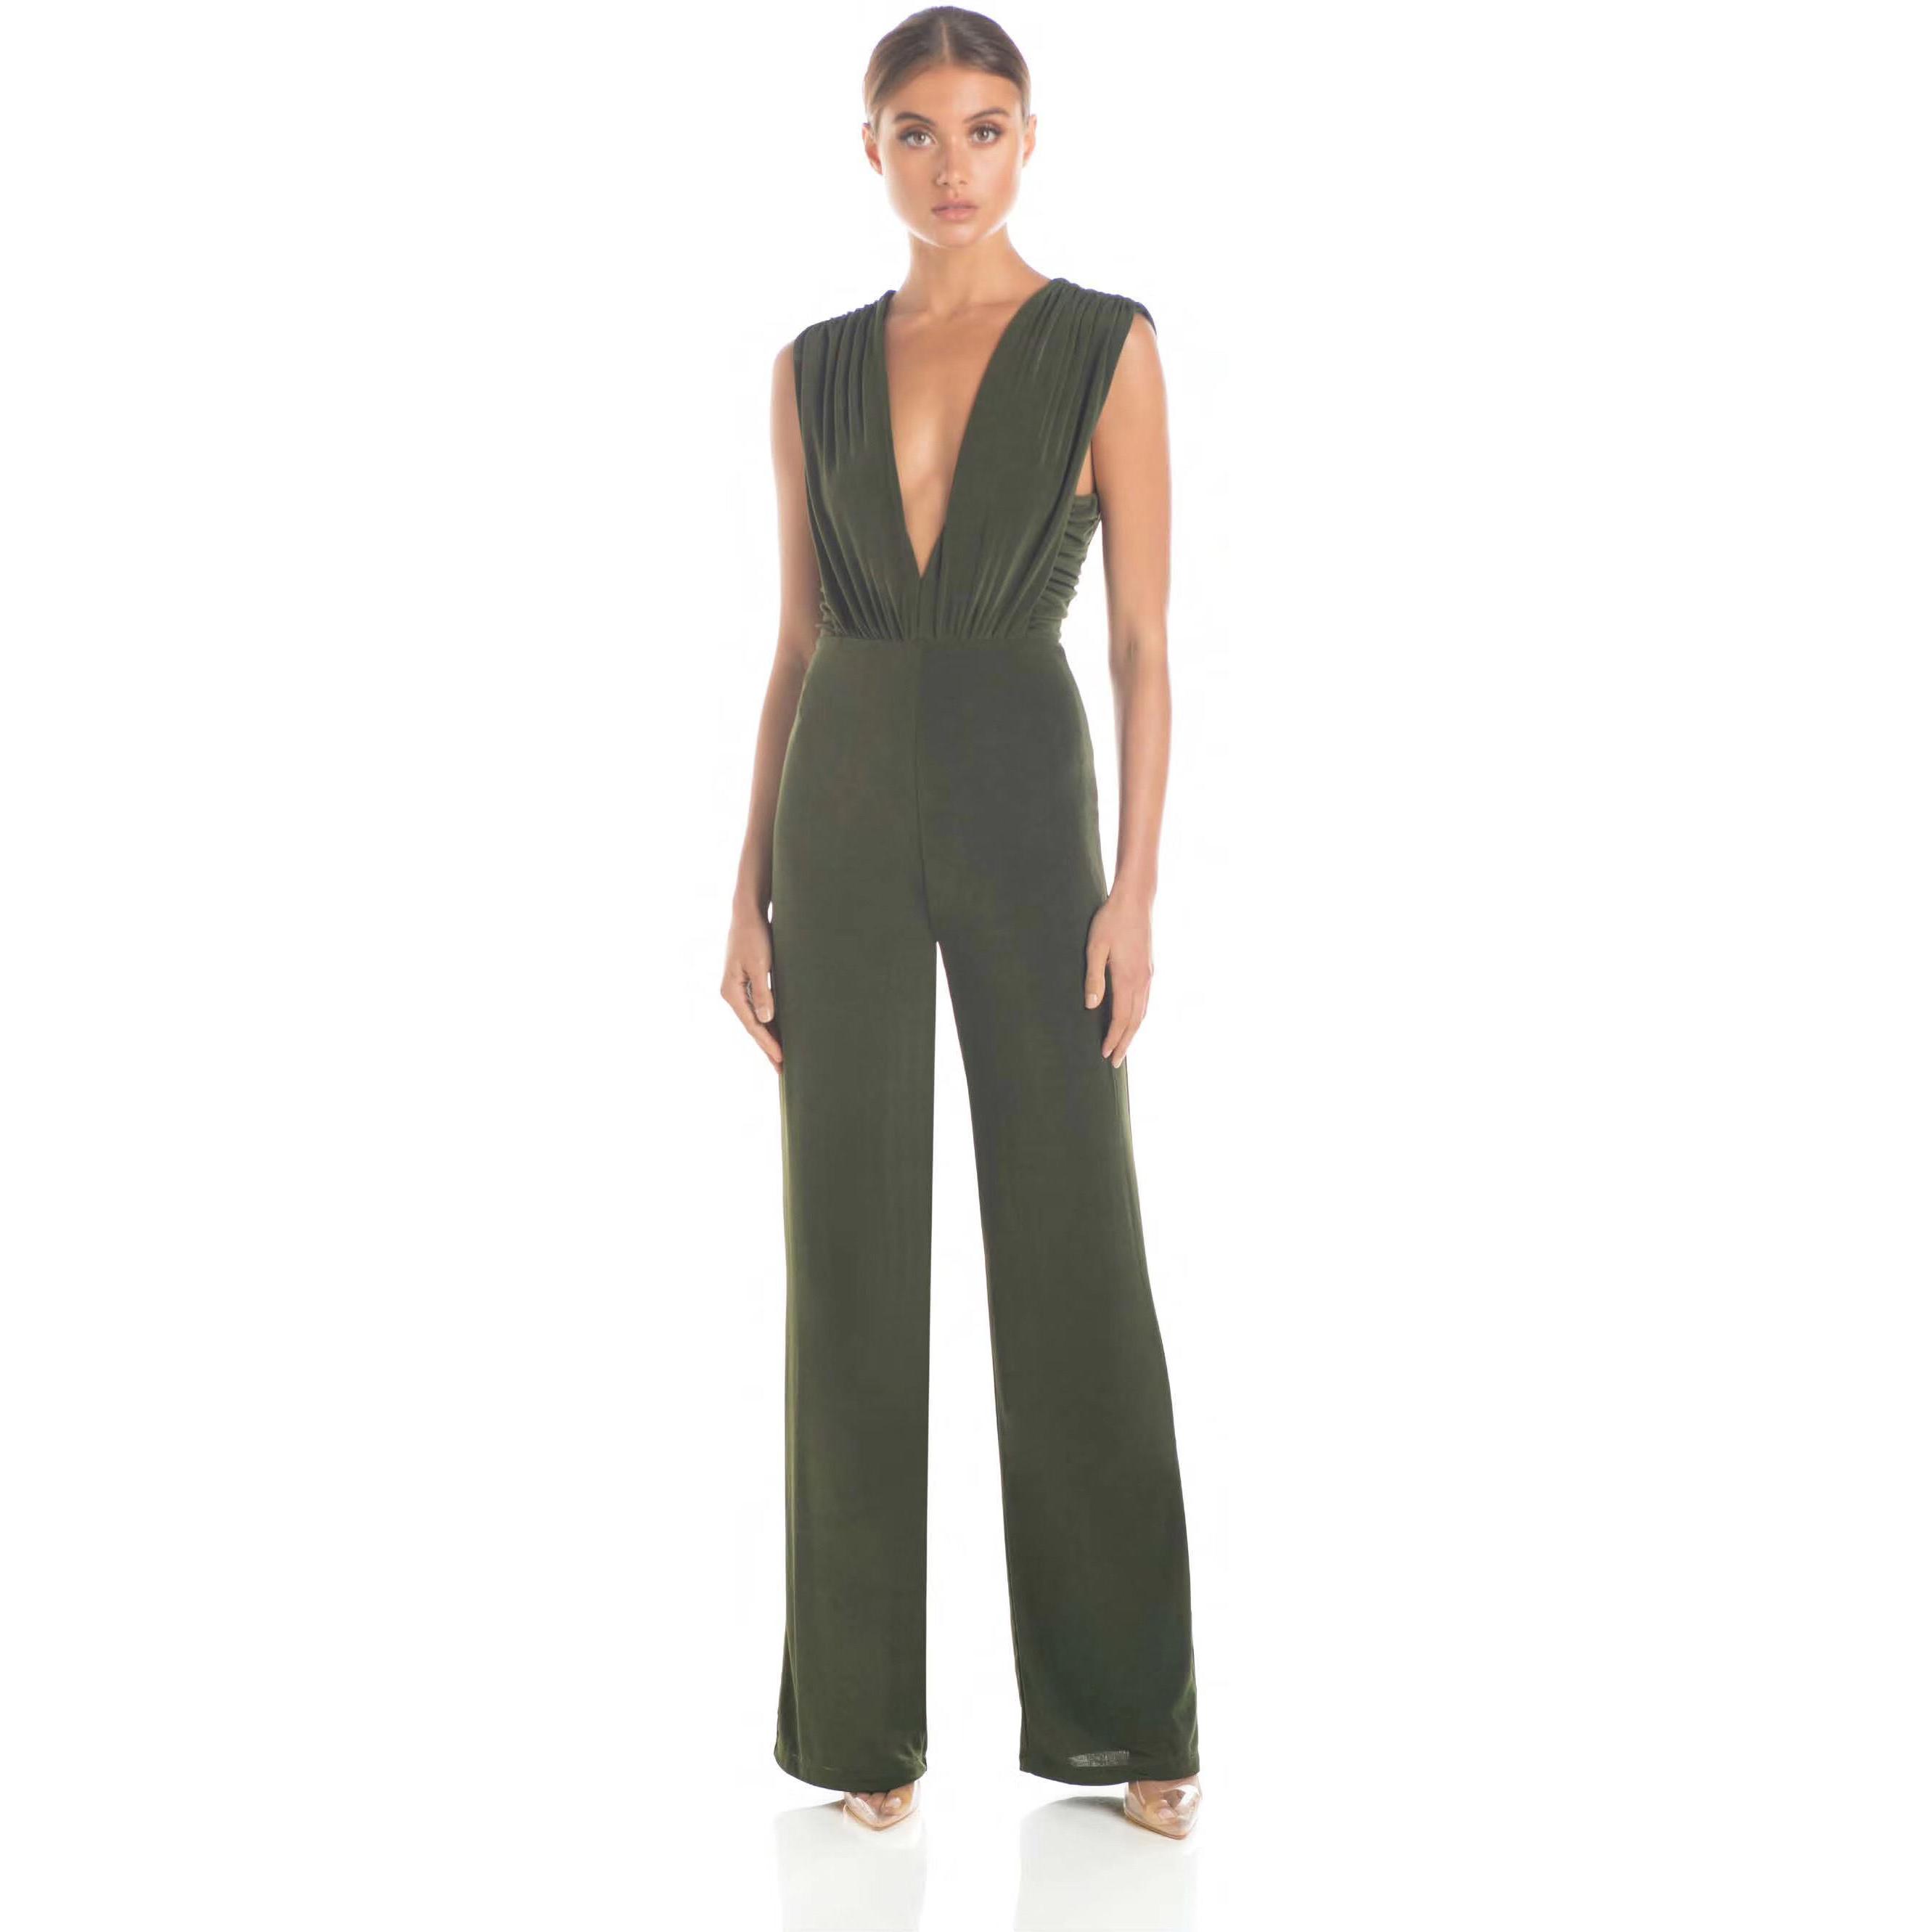 7143e5a7905a Venta al por mayor vestimenta formal pantalon mujer-Compre online ...